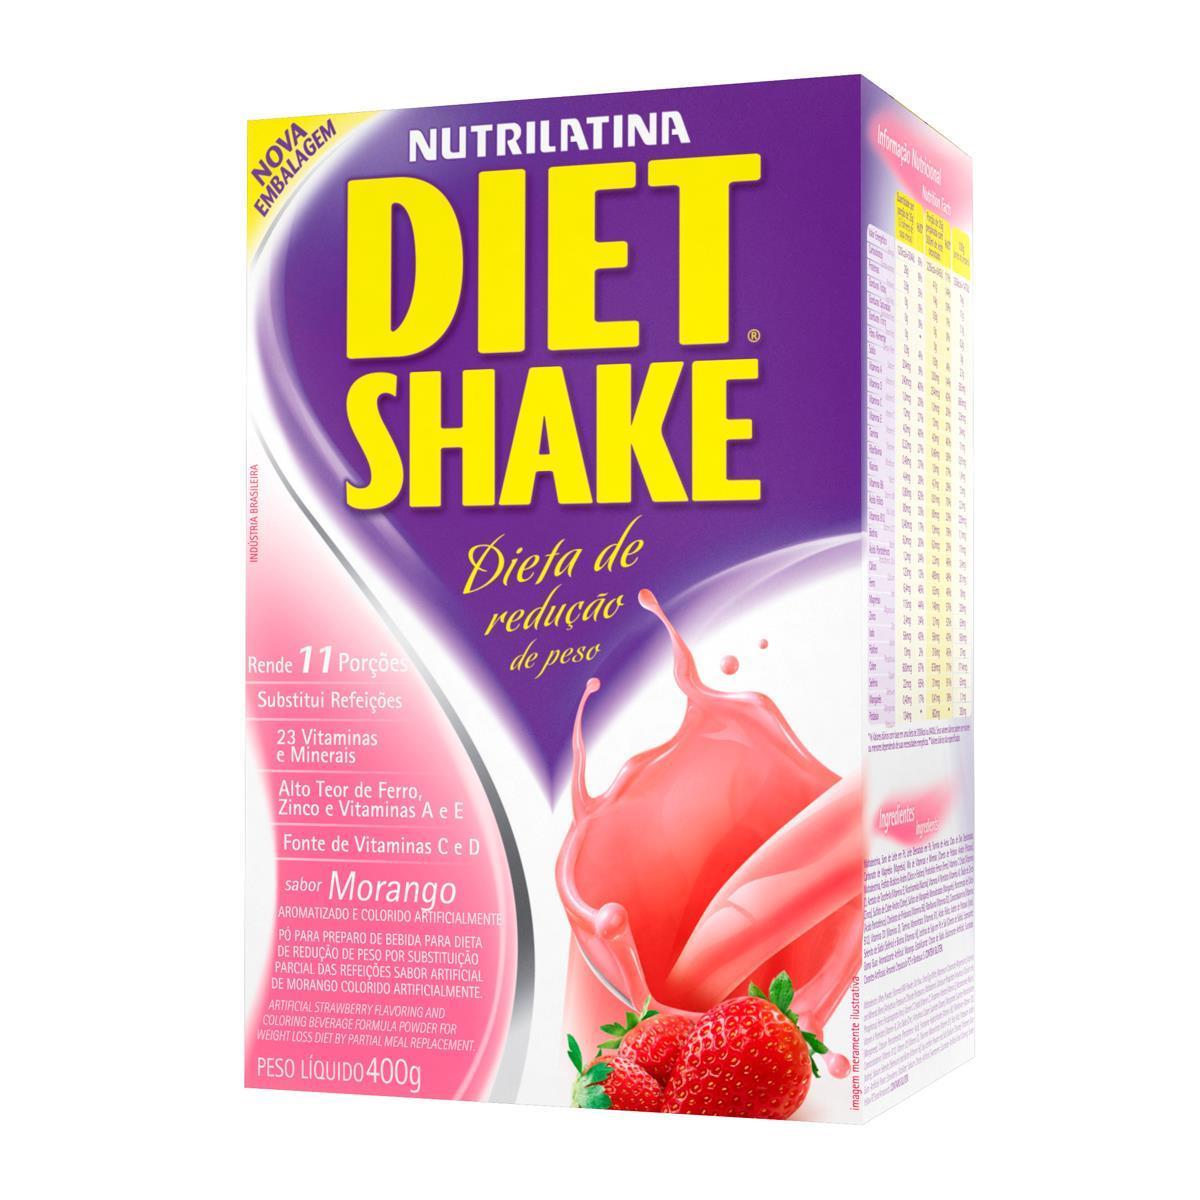 DIET SHAKE TRADICIONAL (400g) - Morango - AGE